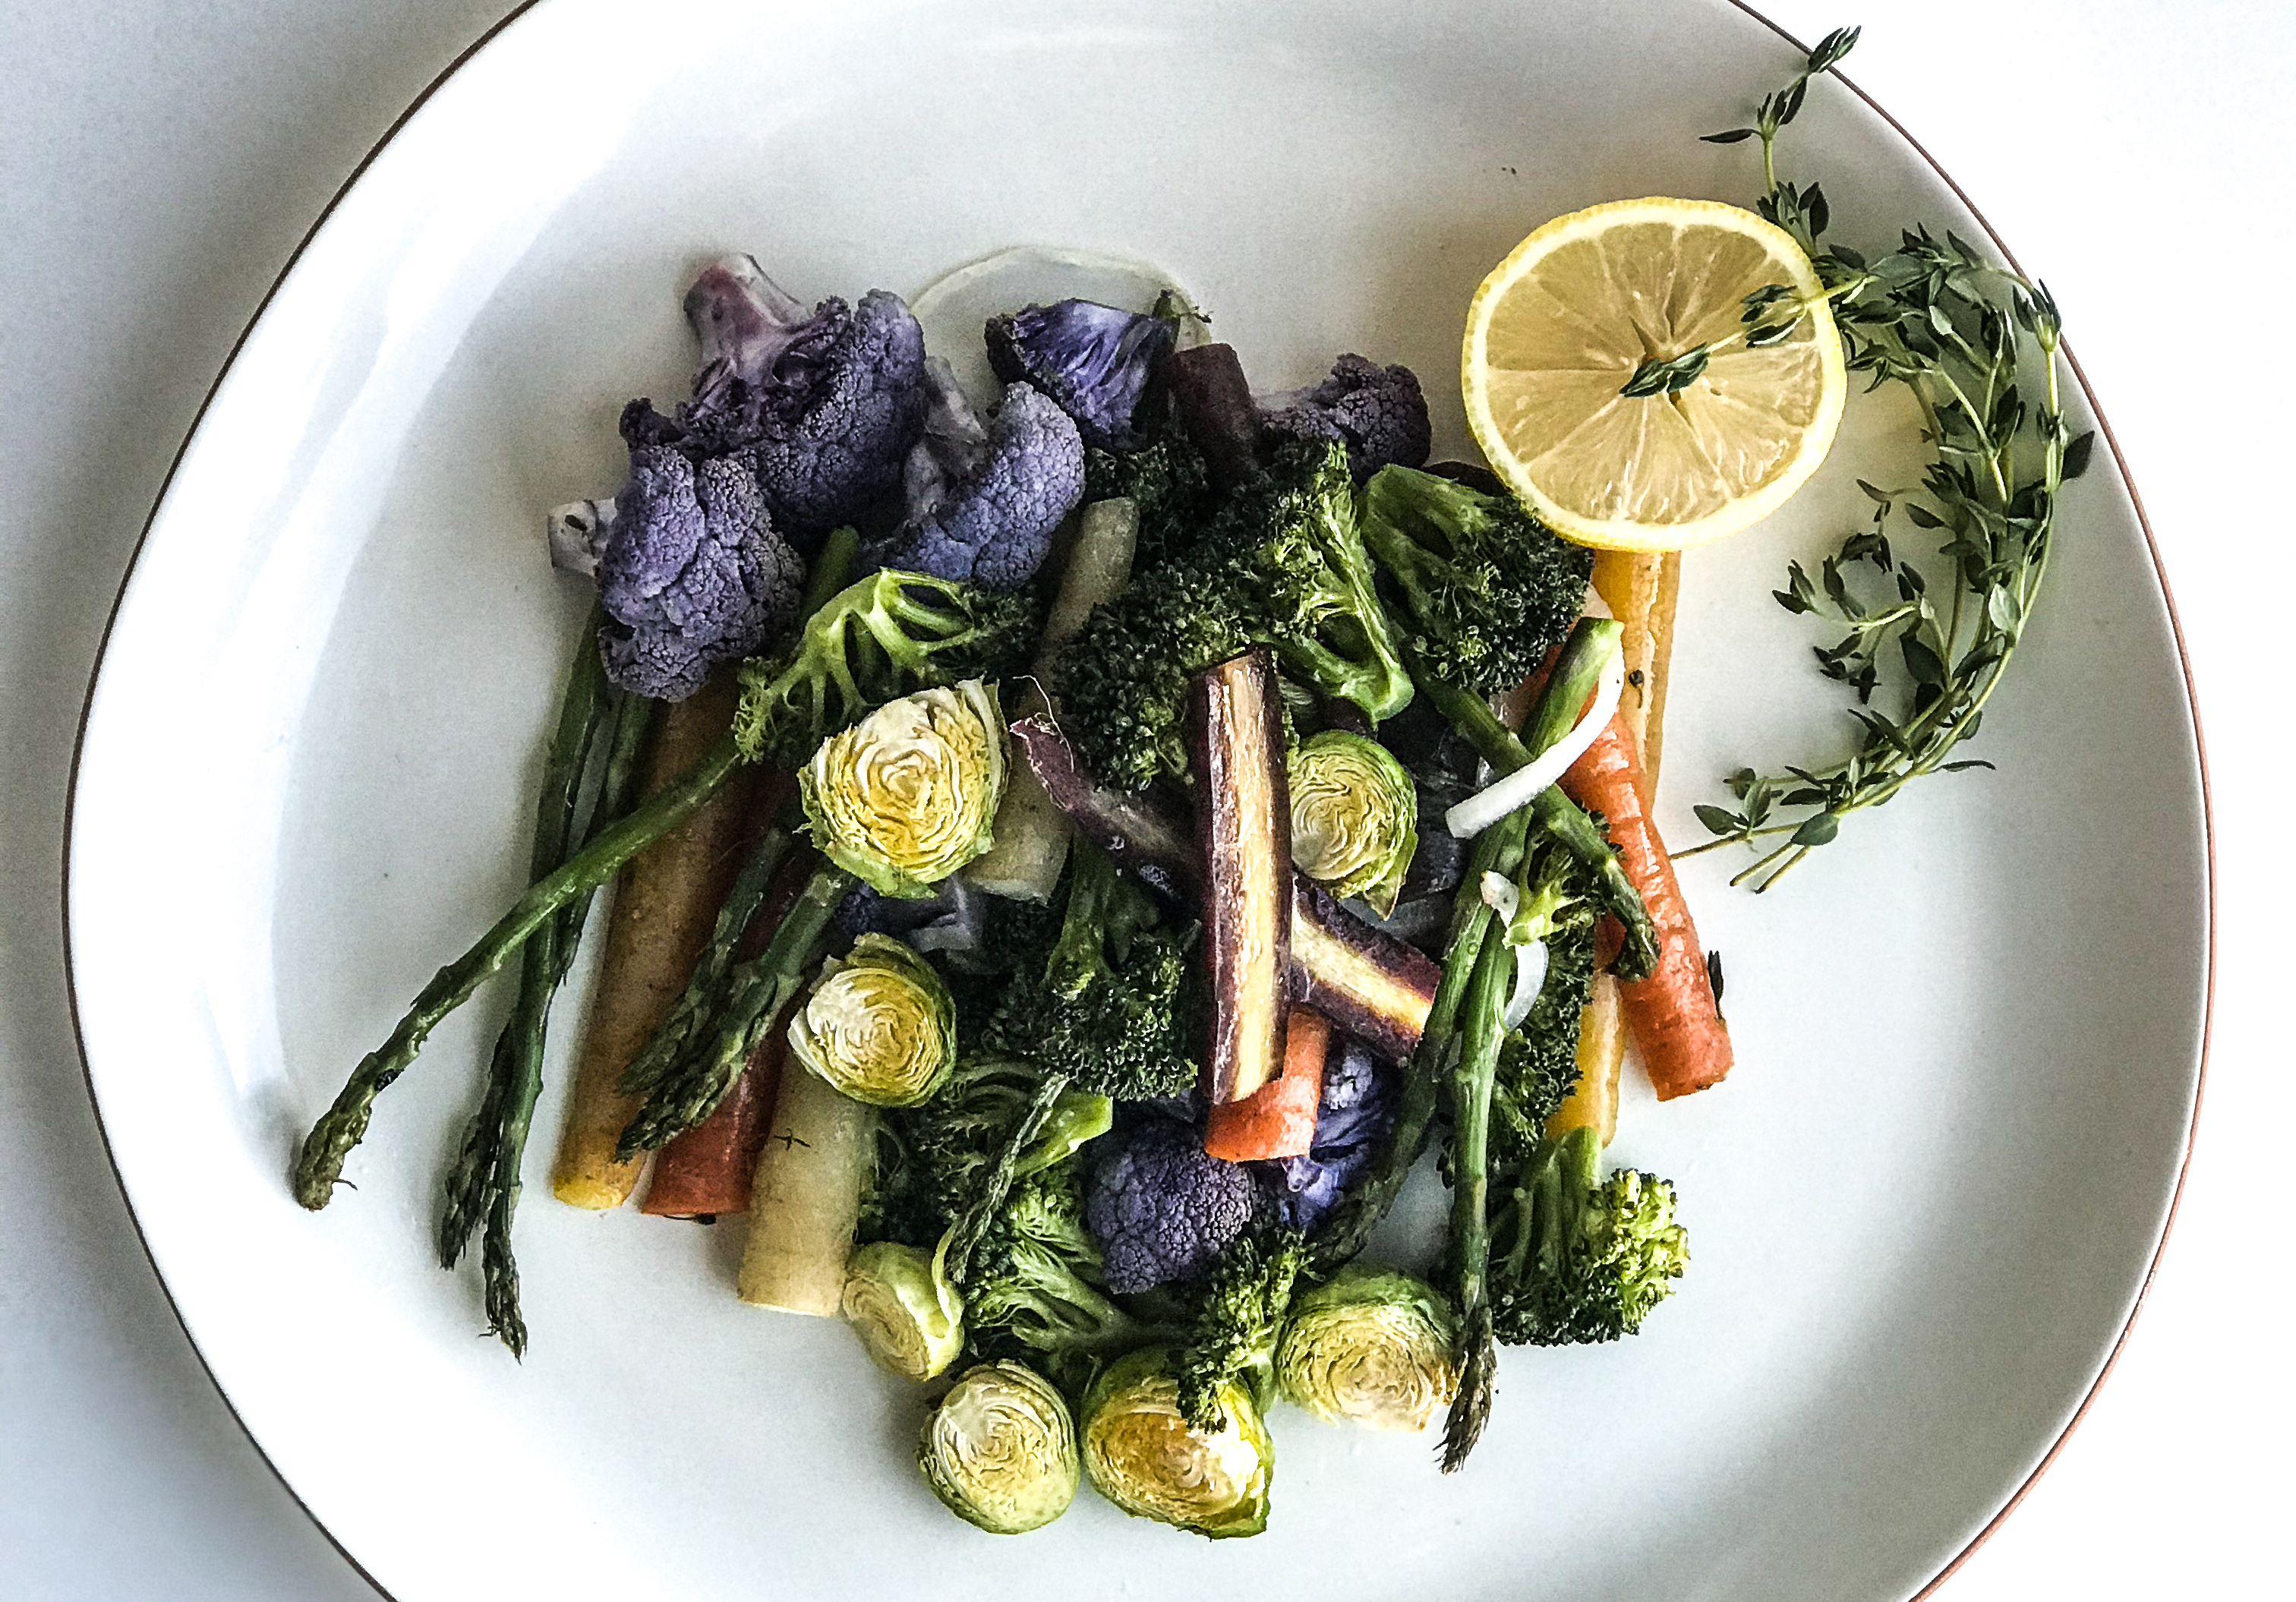 Sheet-Pan Roasted Vegetables